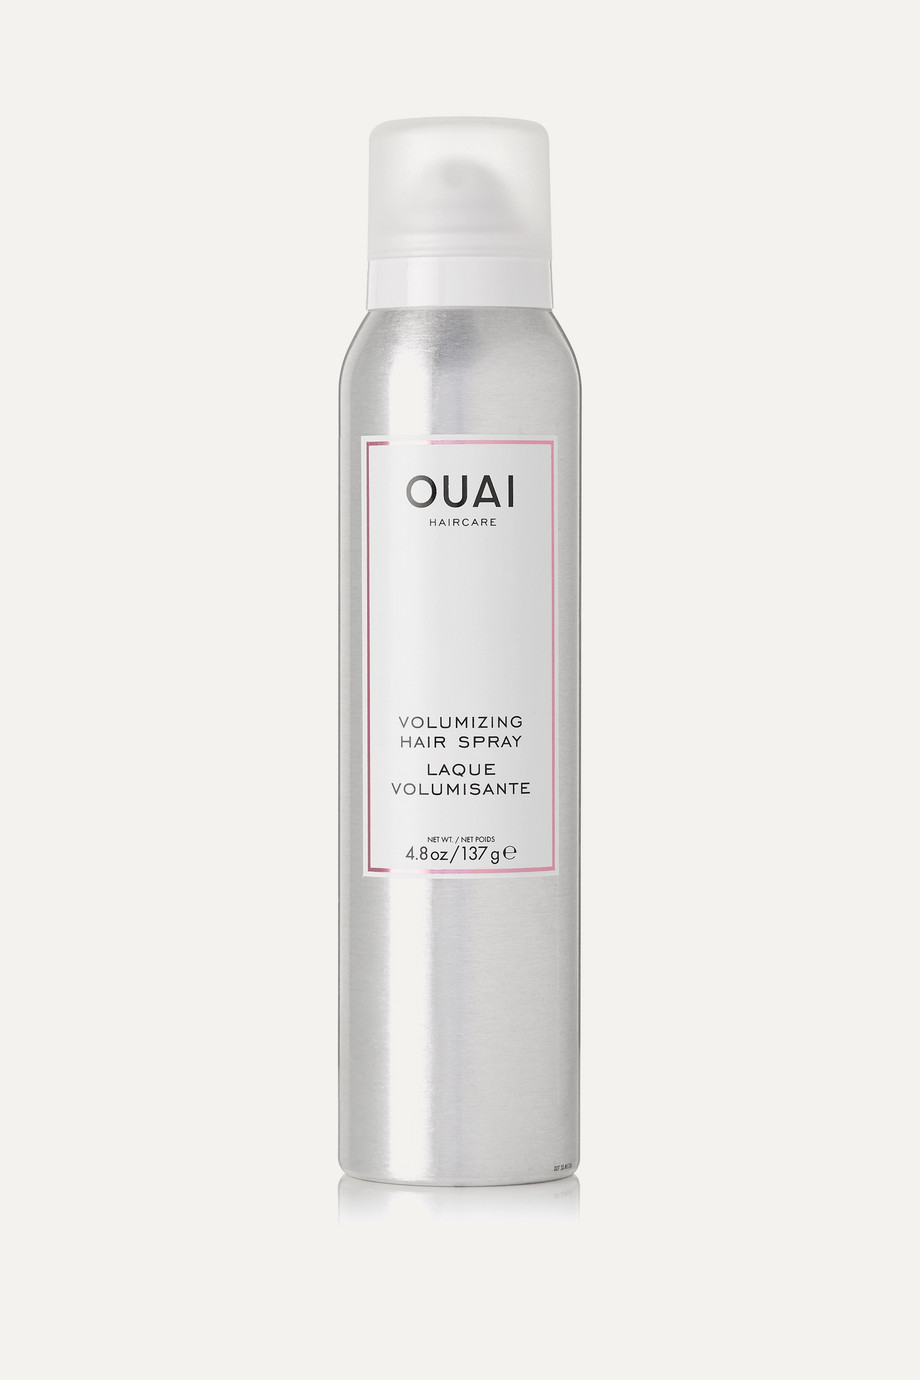 OUAI Haircare Volumizing Hair Spray, 137g